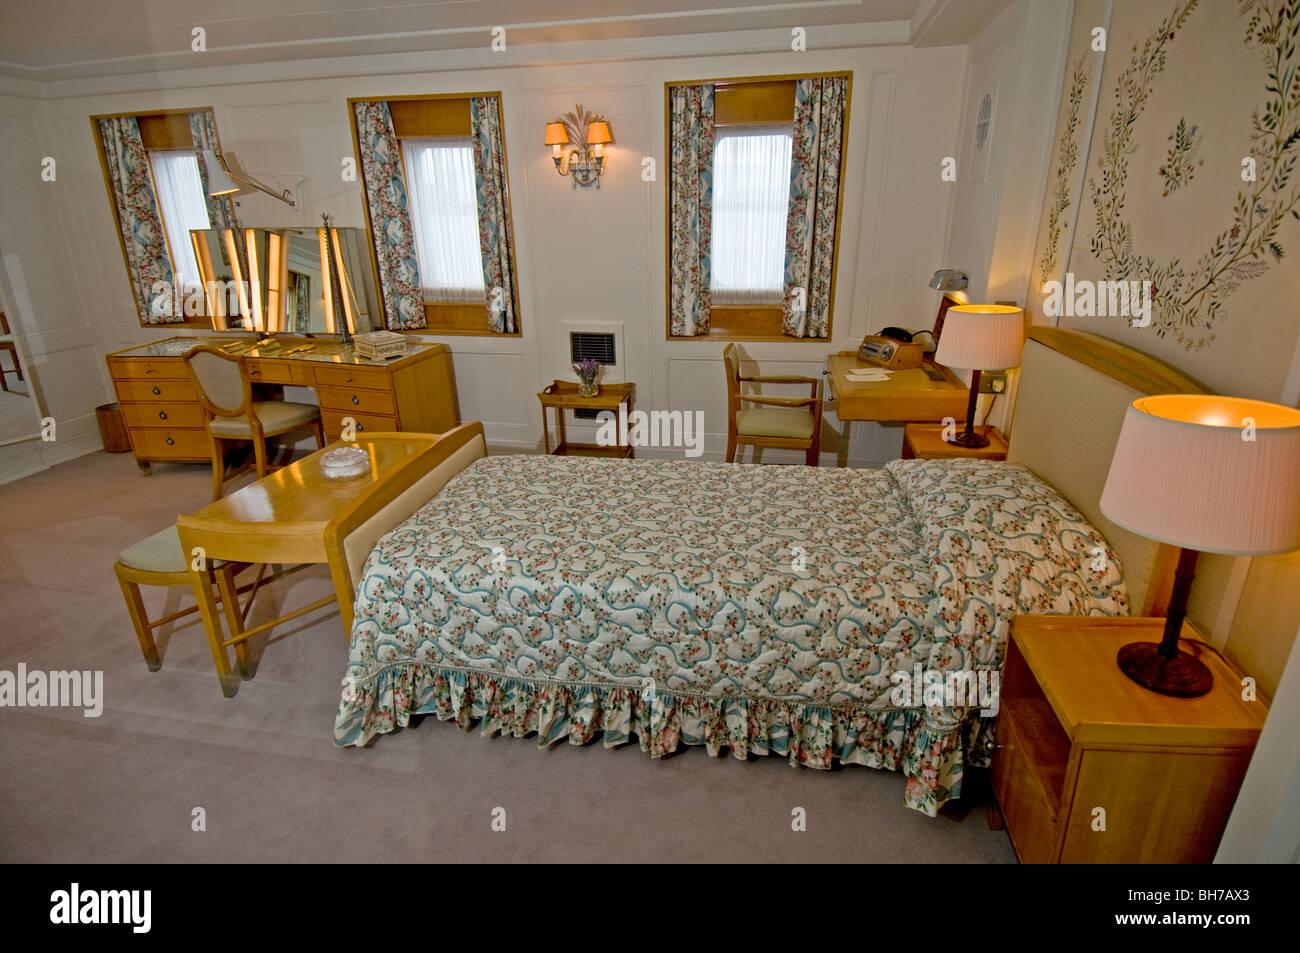 britannia royal queen yacht stockfotos britannia royal queen yacht bilder alamy. Black Bedroom Furniture Sets. Home Design Ideas